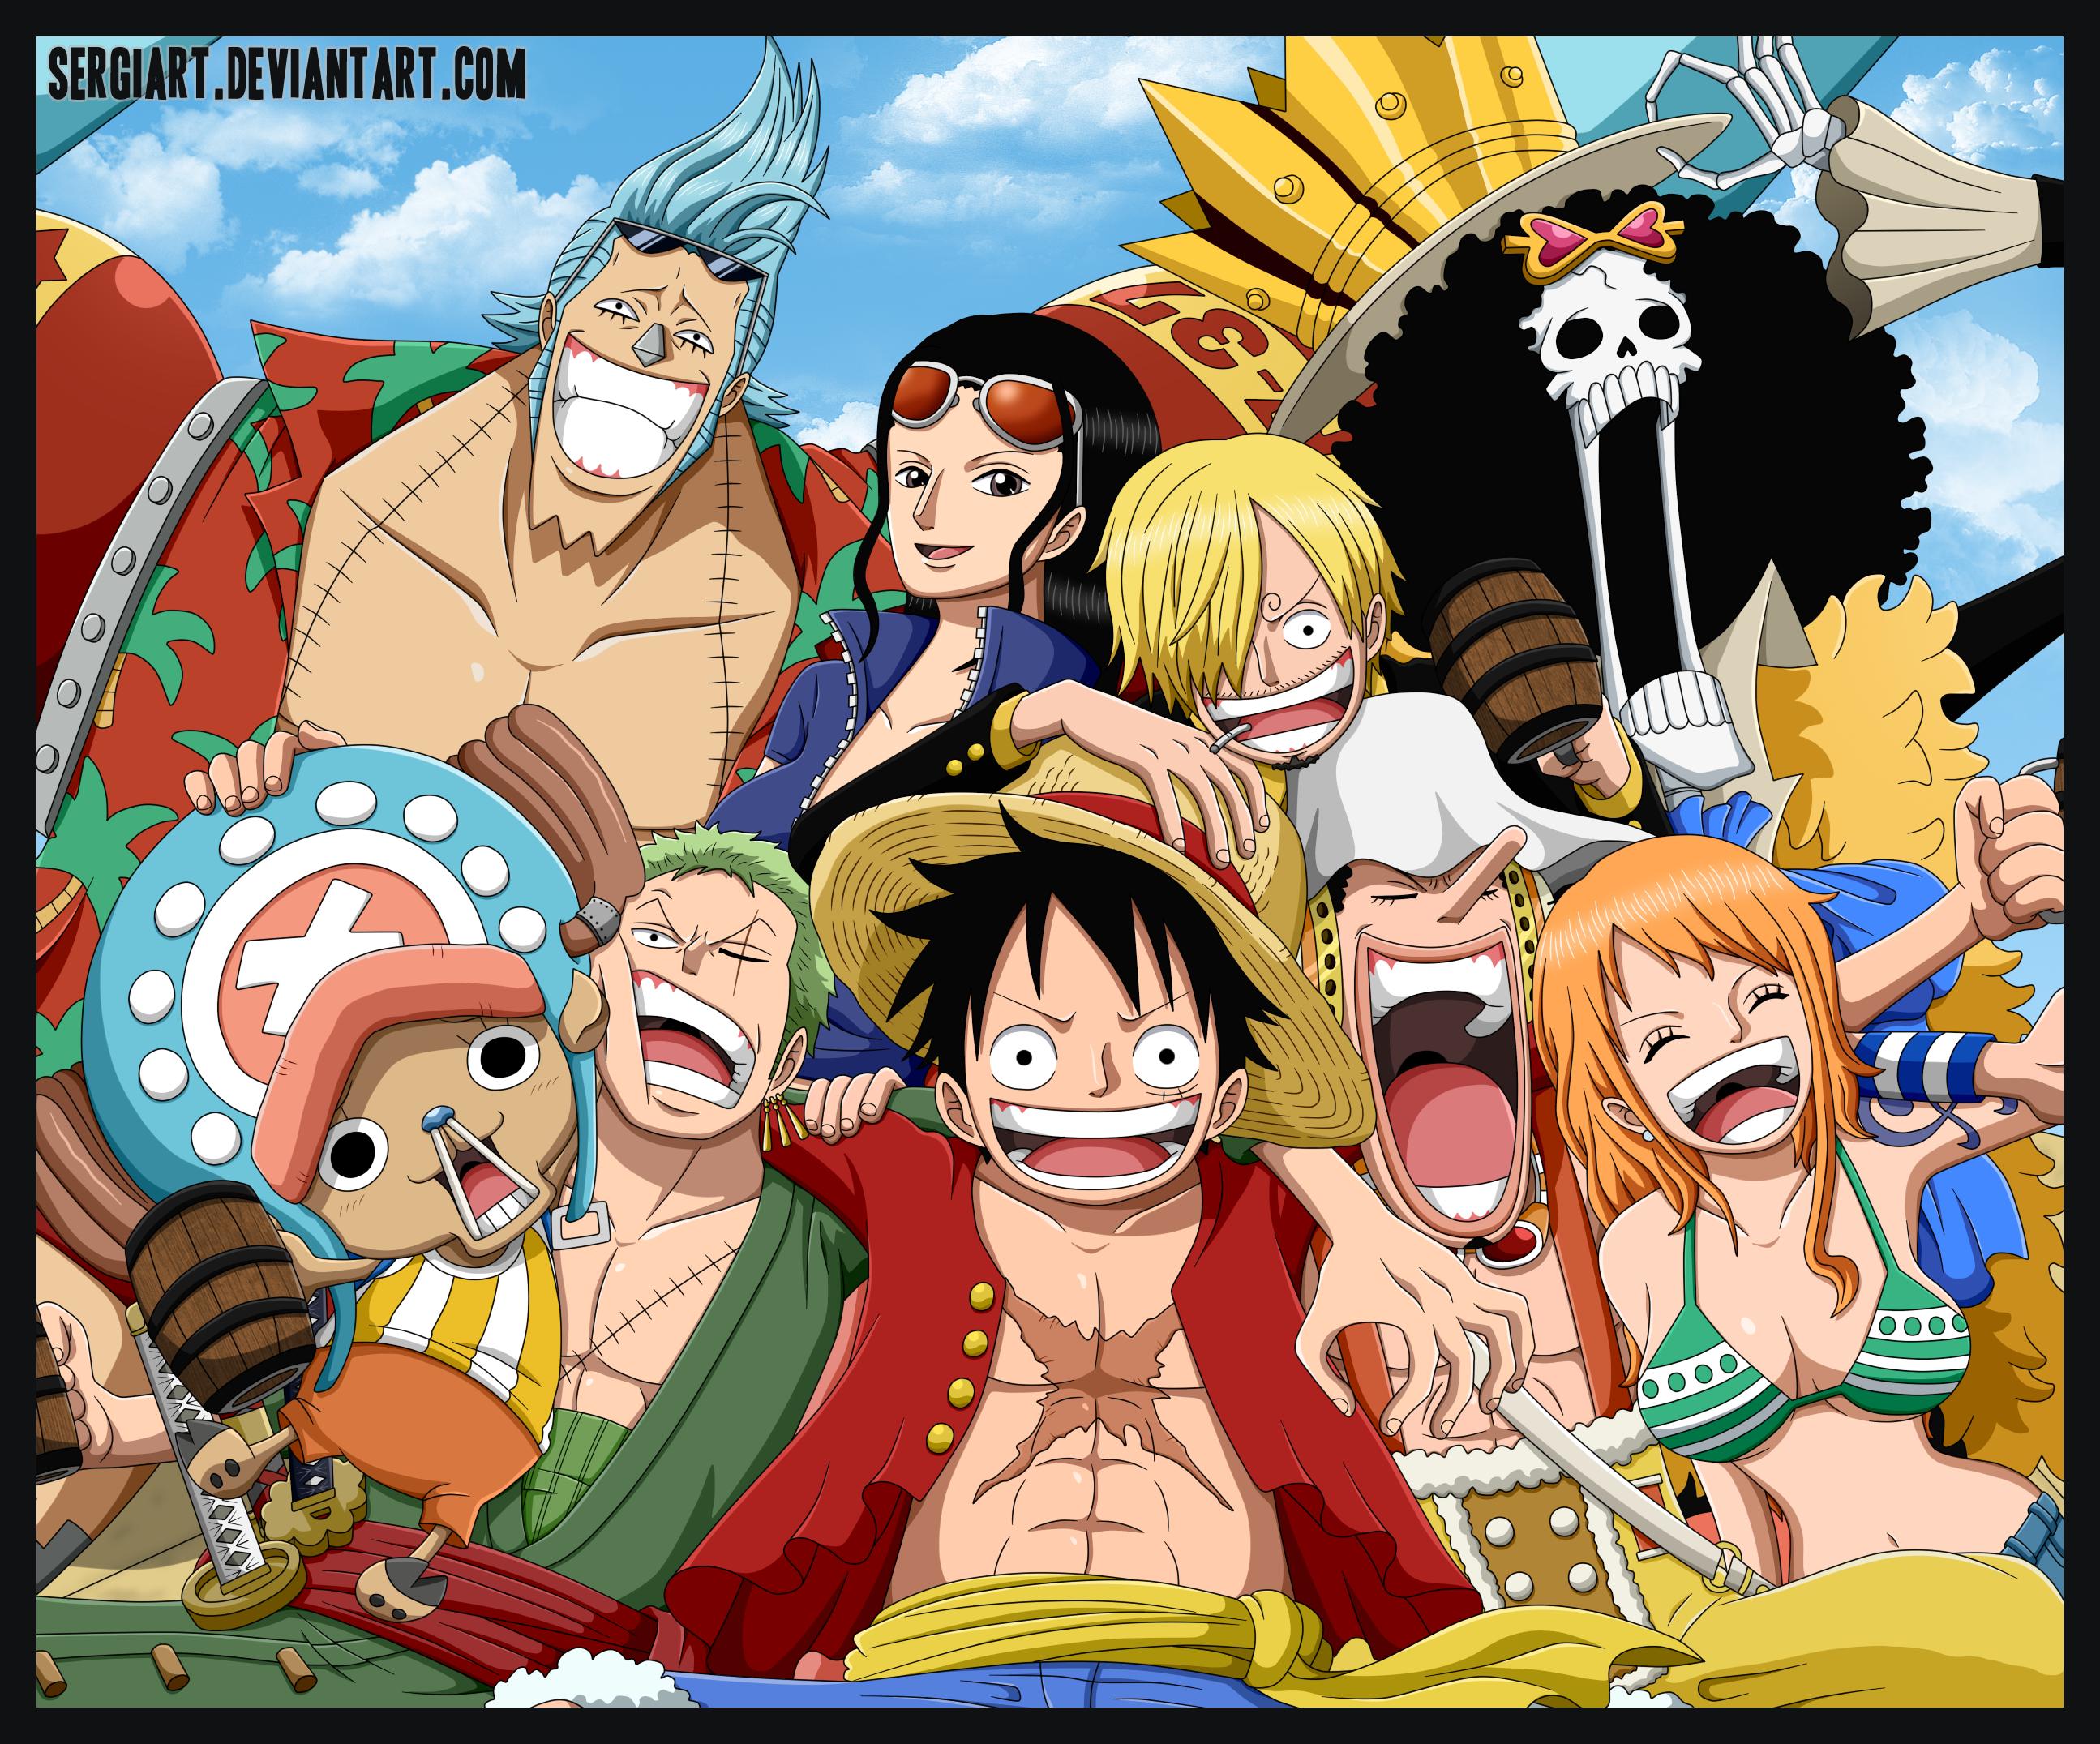 75 One Piece Crew Wallpaper On Wallpapersafari